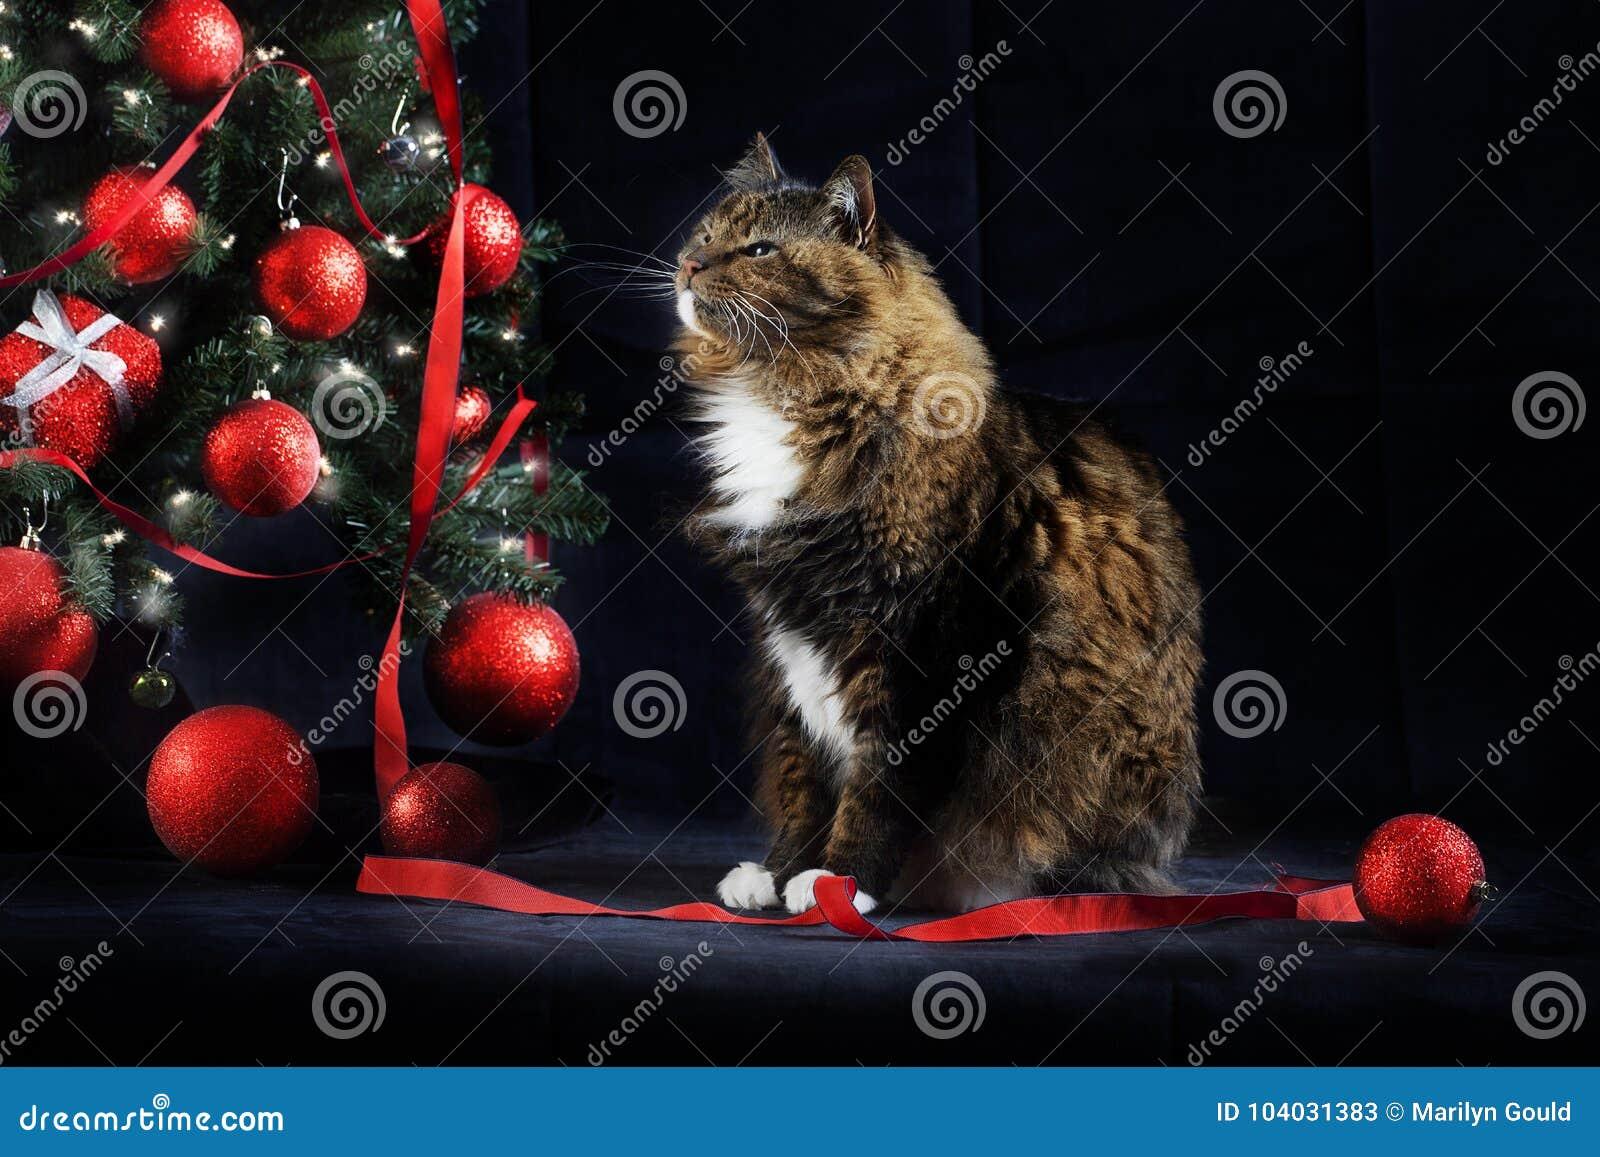 Cat Looking at Christmas Tree